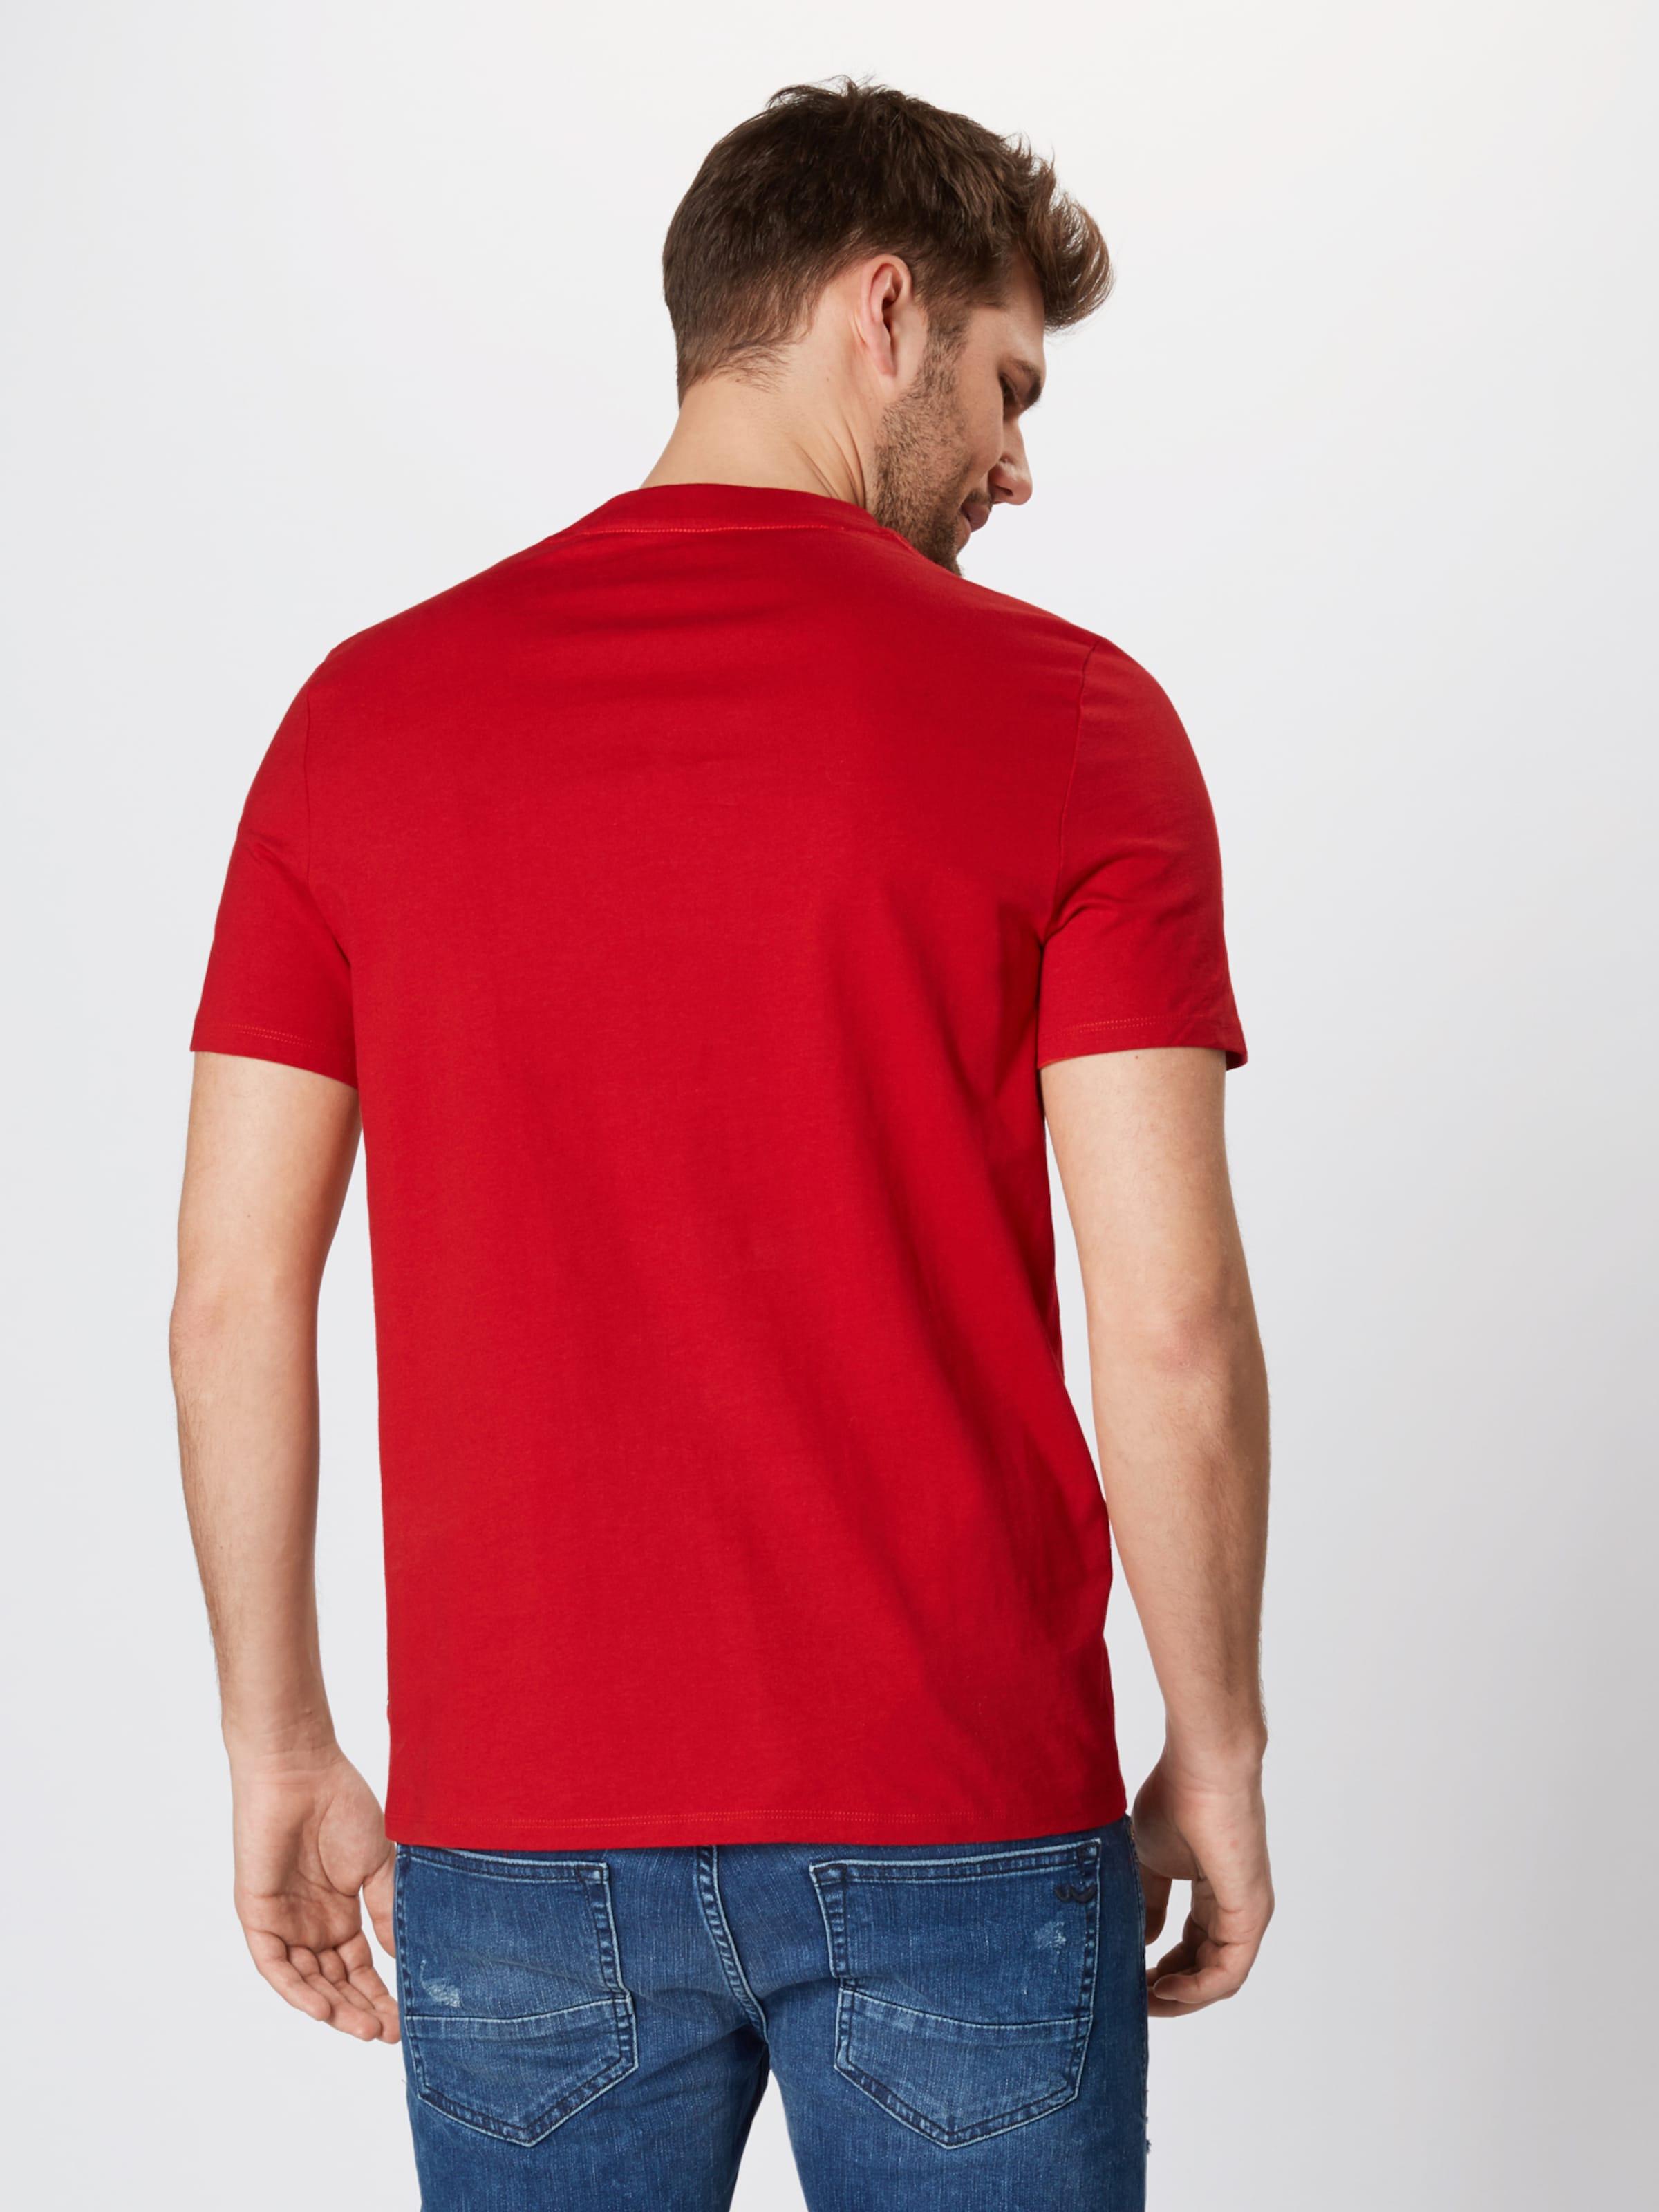 In Guess Guess Shirt In Guess Shirt Rot Shirt Rot Shirt In In Guess Rot F1JlcK